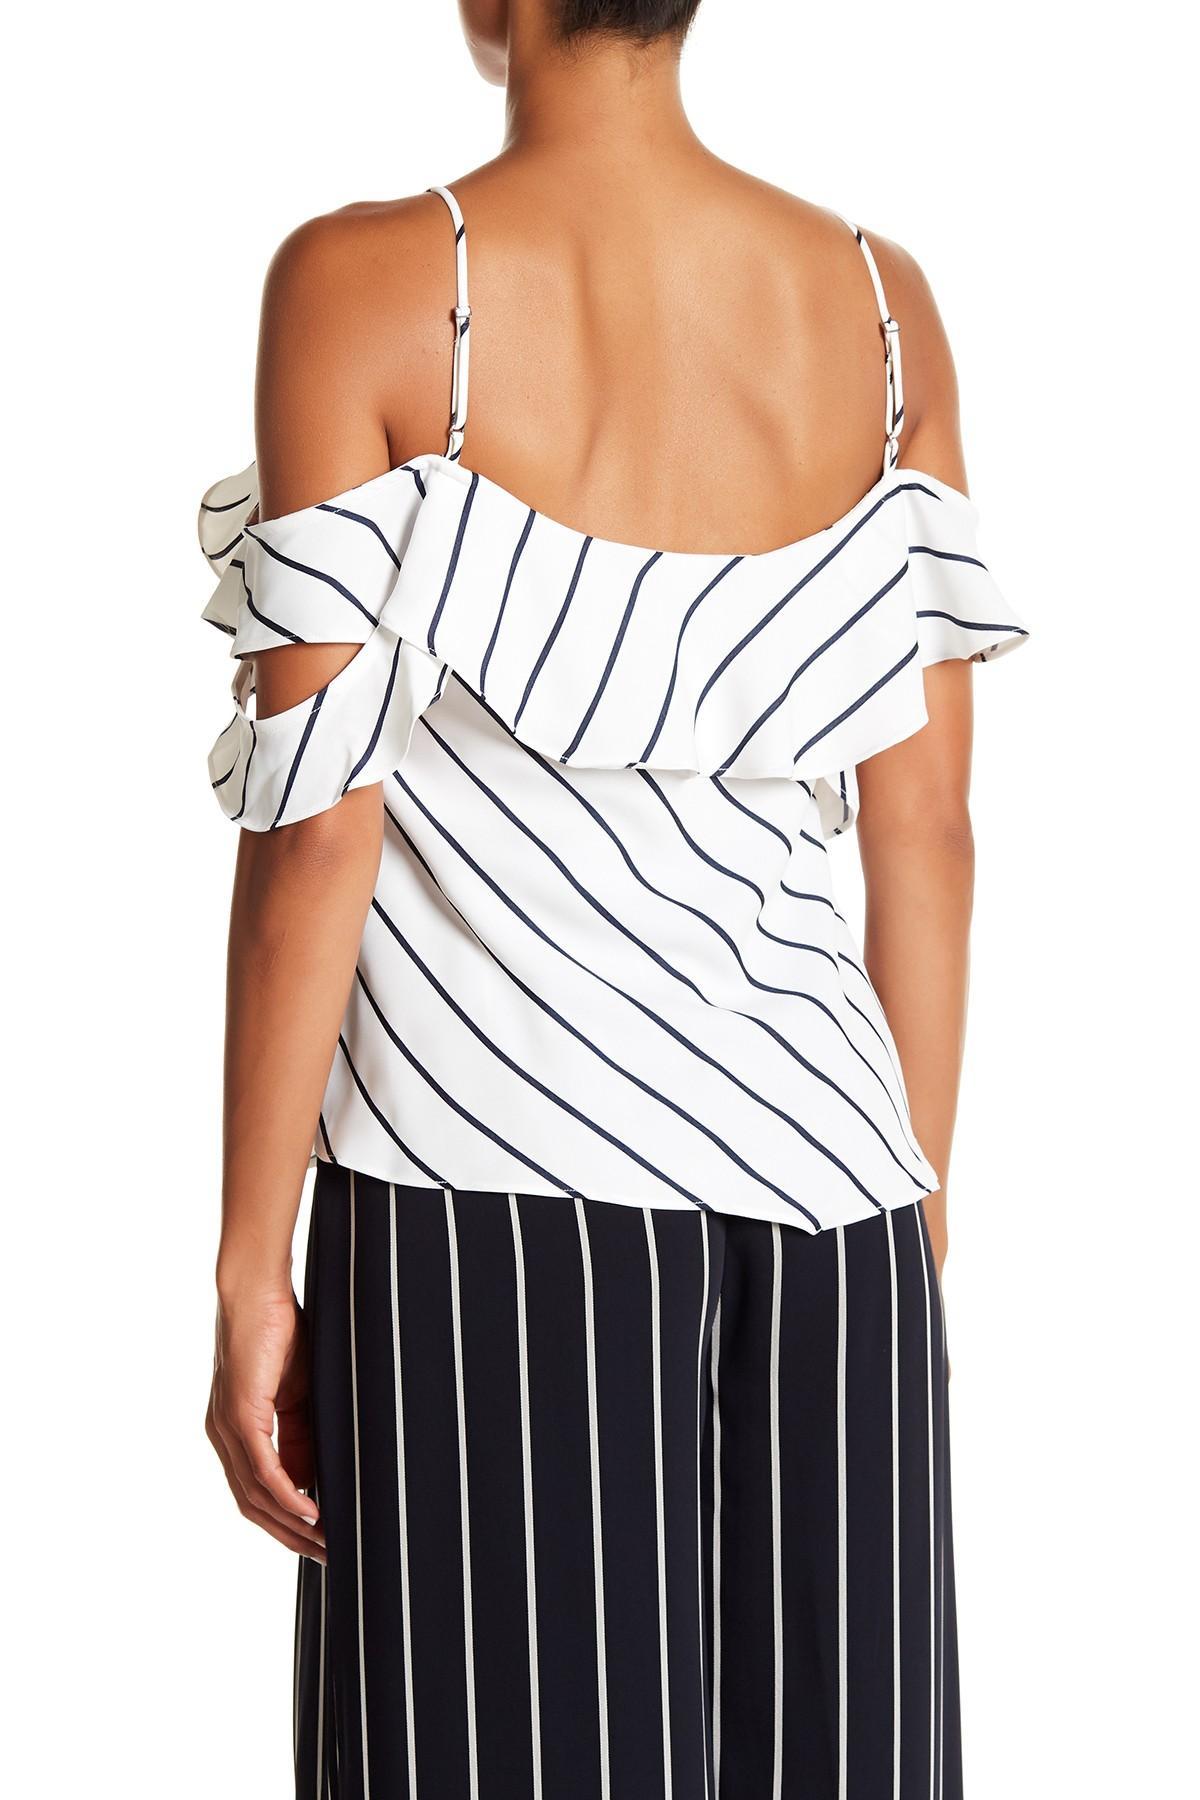 6559fac904a43 ... White Pinstripe Ruffle Wrap Cold Shoulder Camo Blouse - Lyst. View  fullscreen